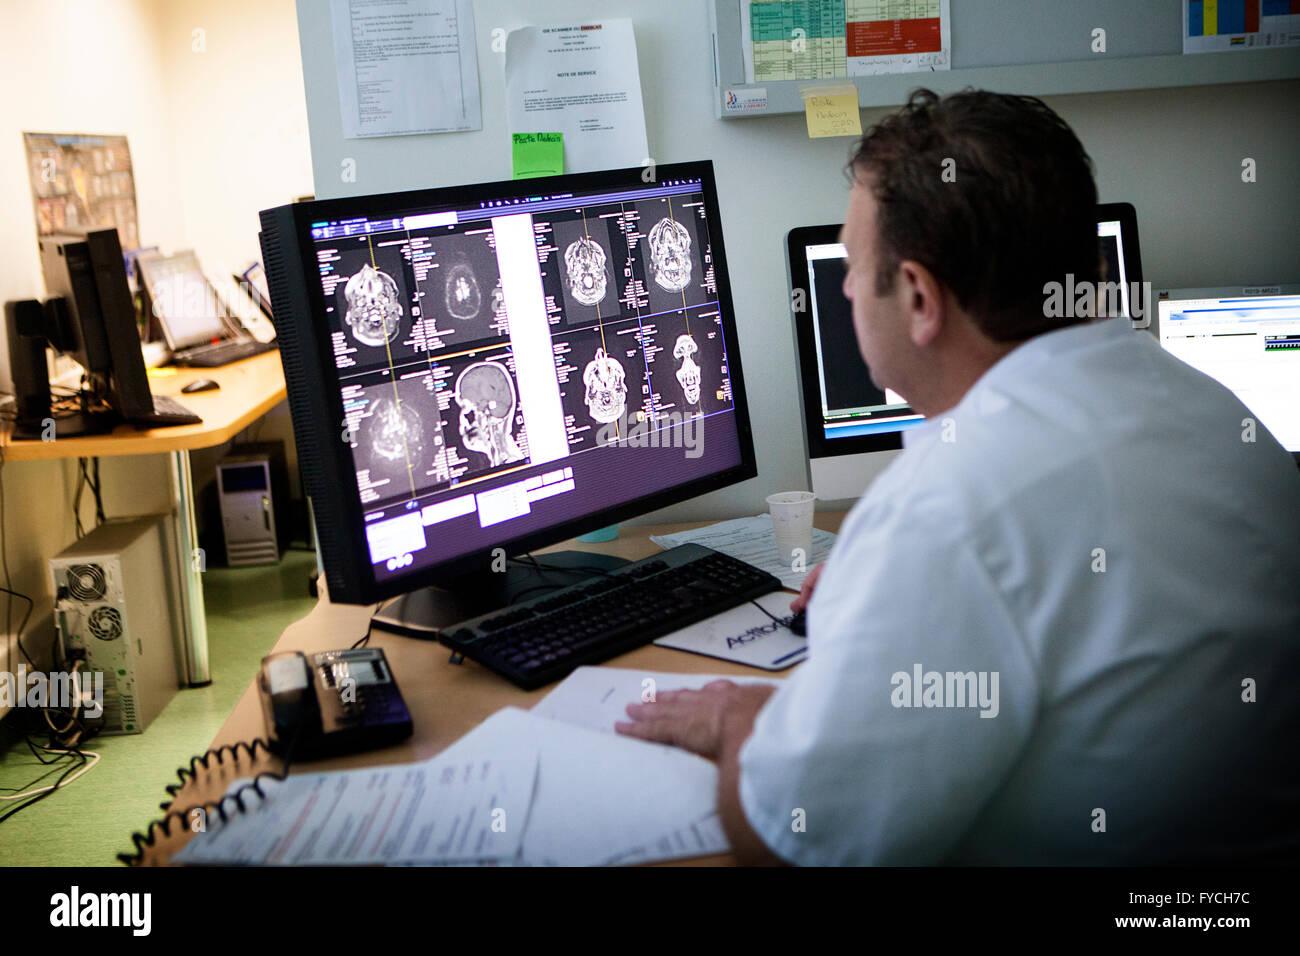 MRI EXAMINATION - Stock Image